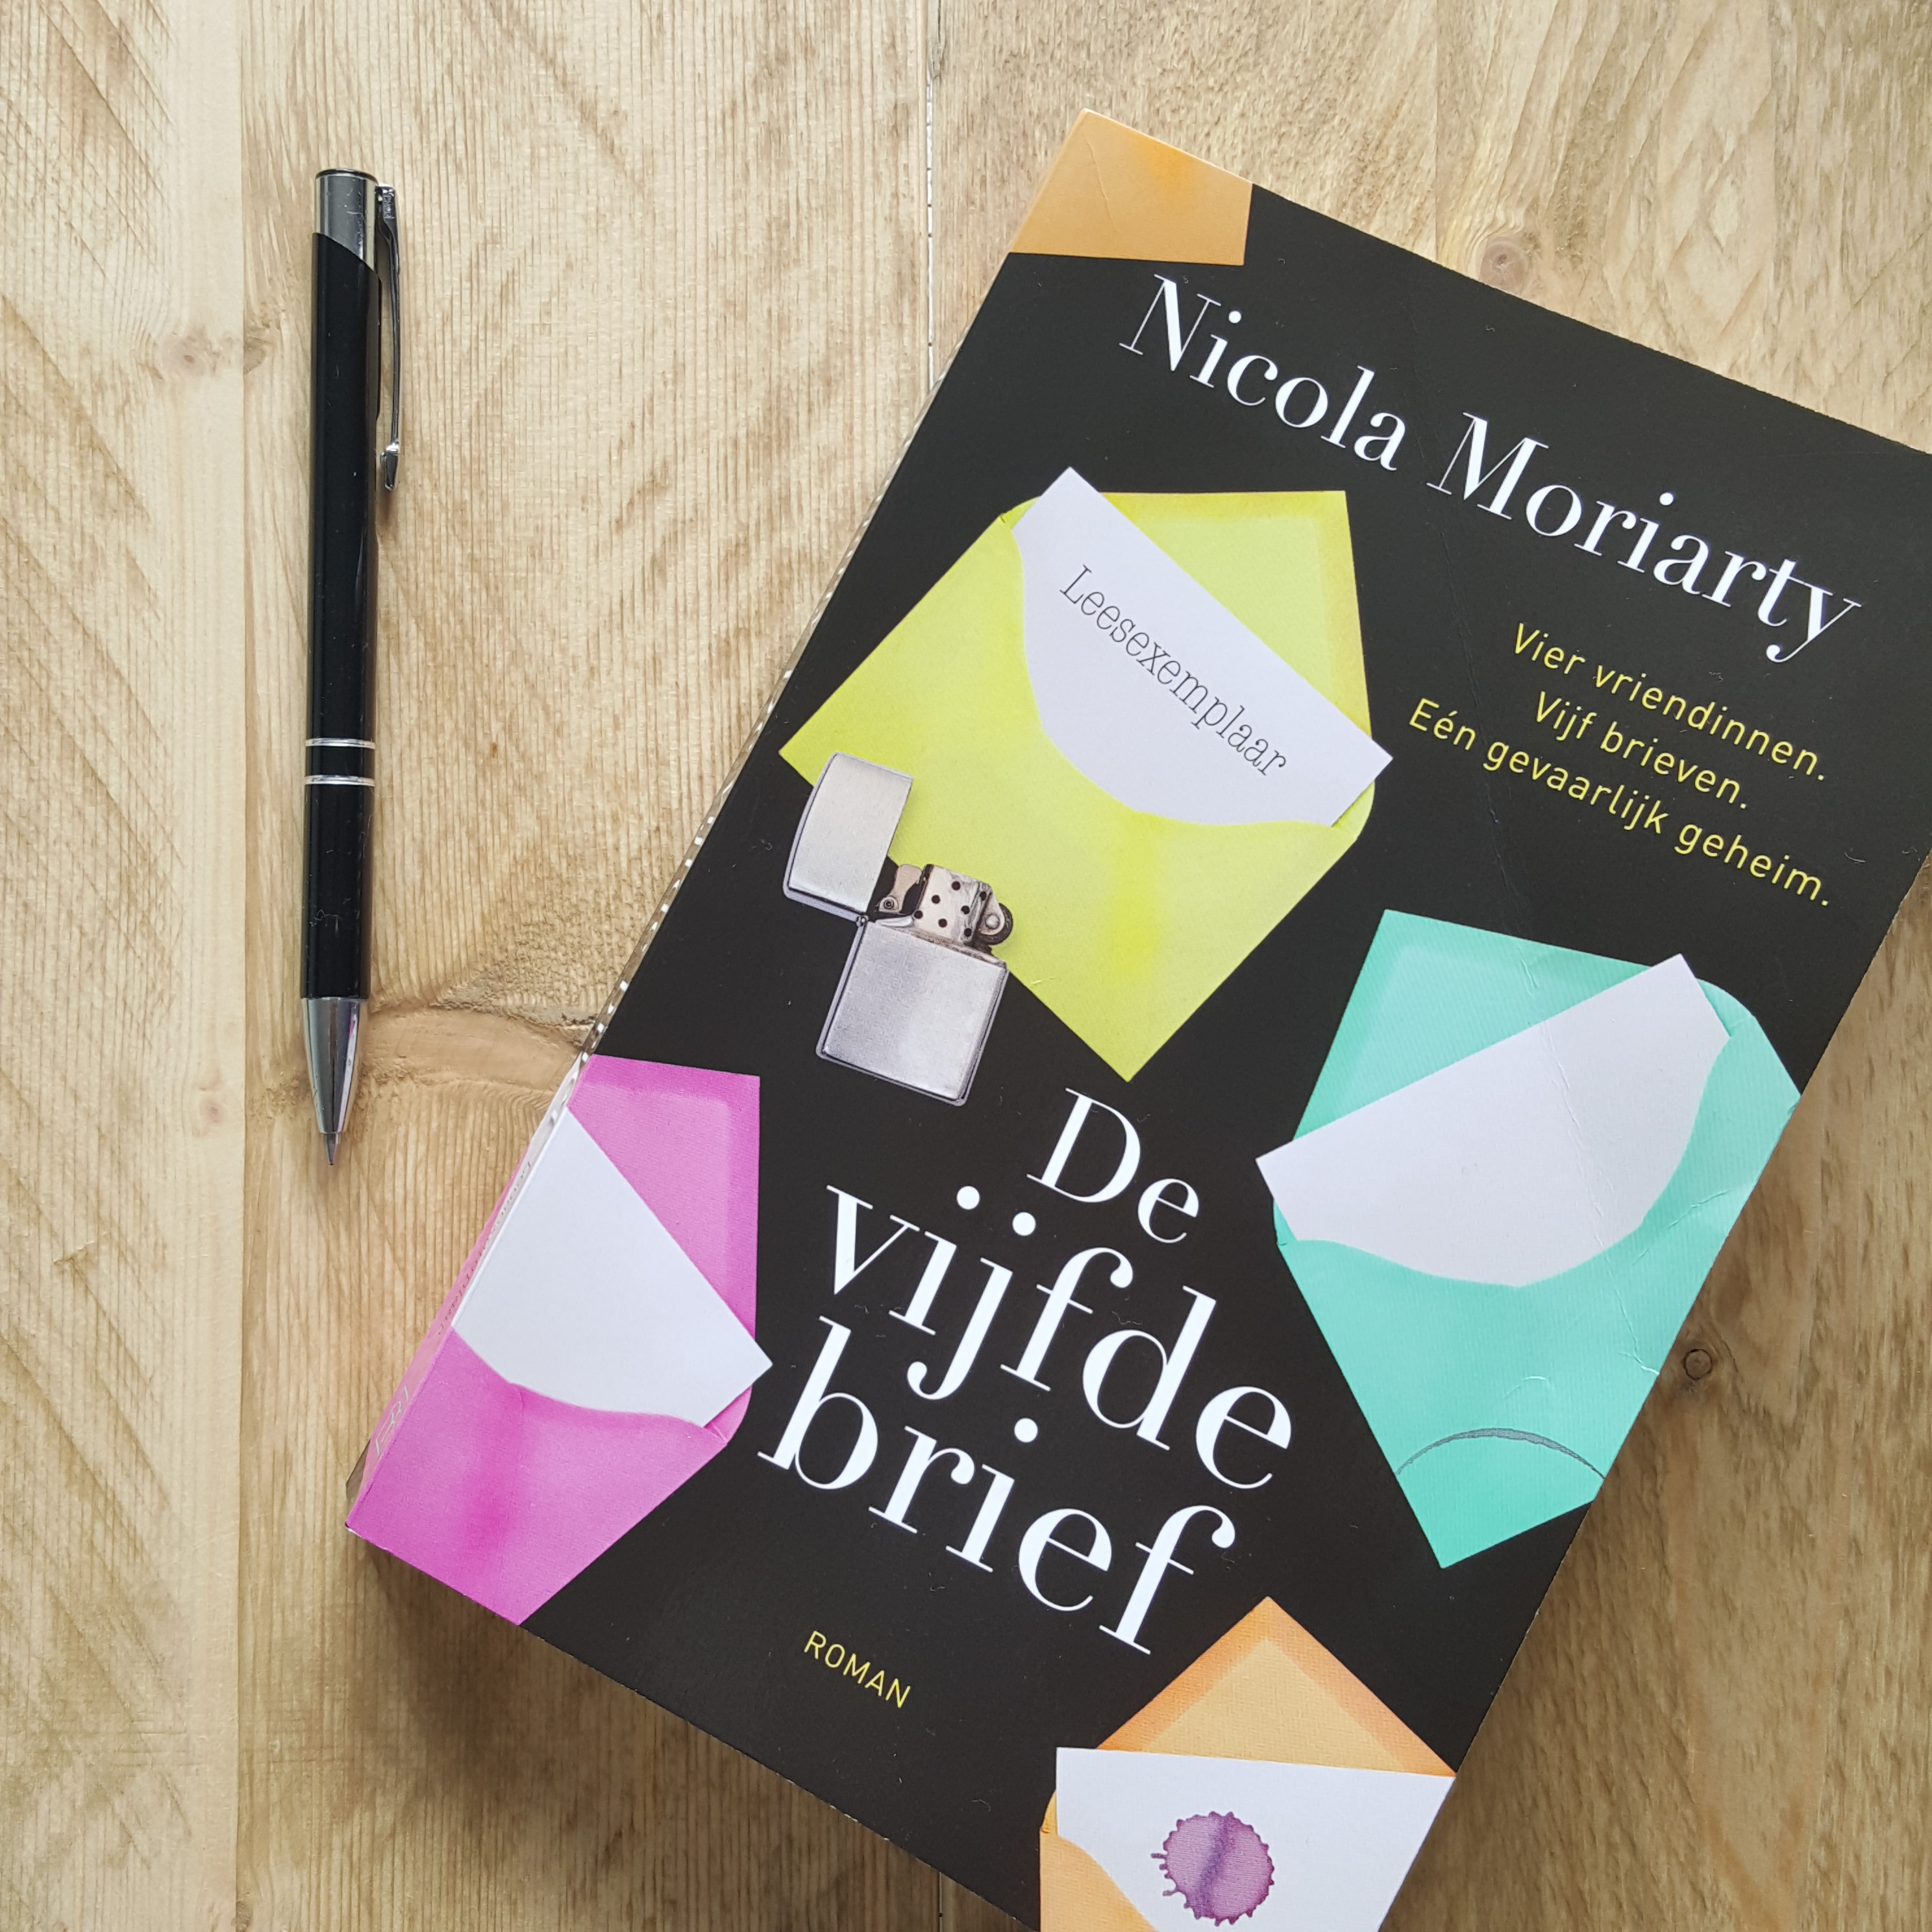 Recensie – De vijfde brief door Nicola Moriarty